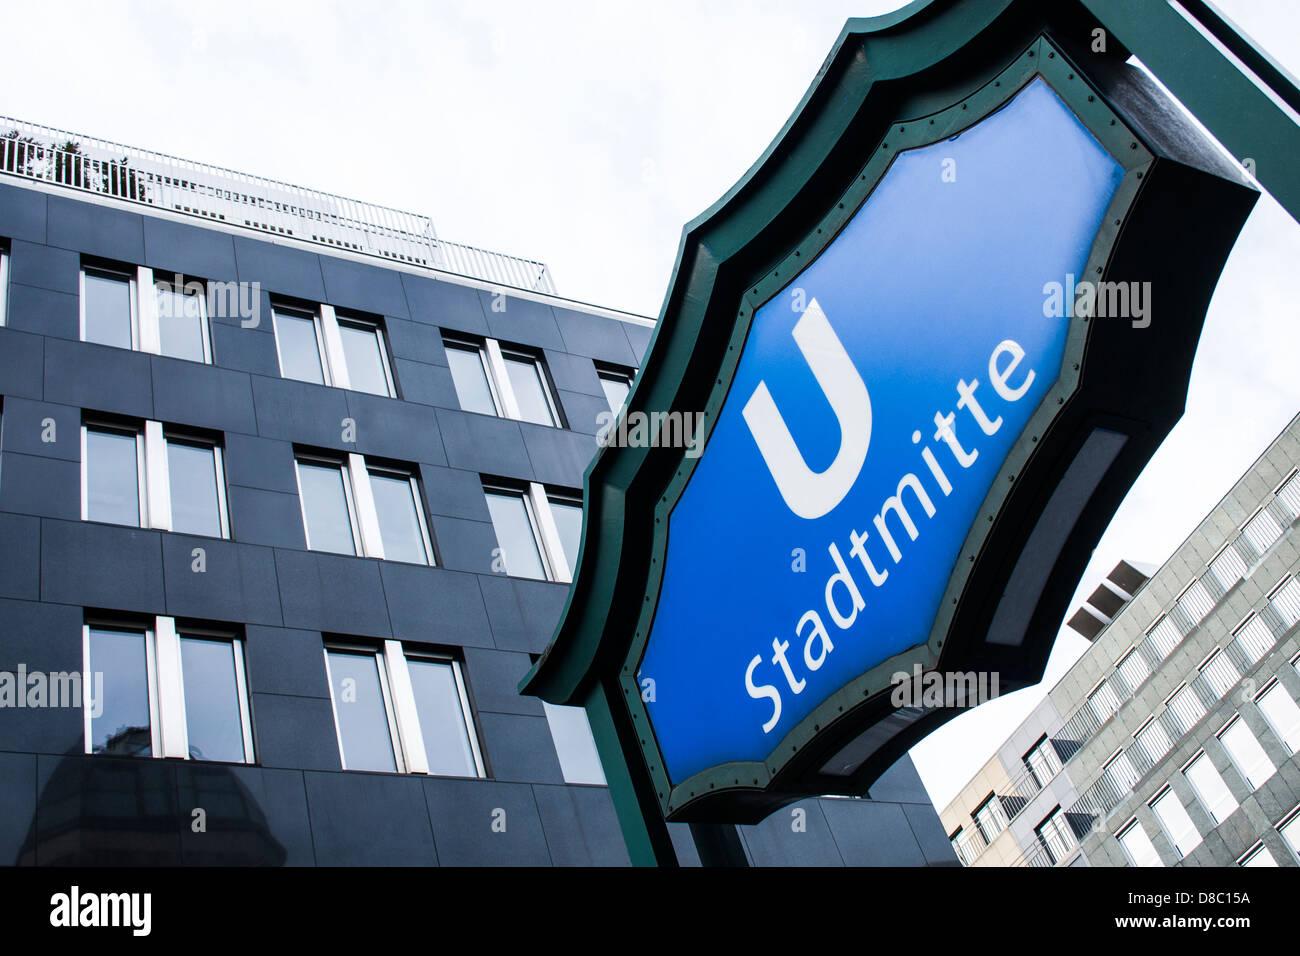 Subway station sign (U-Bahn). Berlin, Germany. - Stock Image